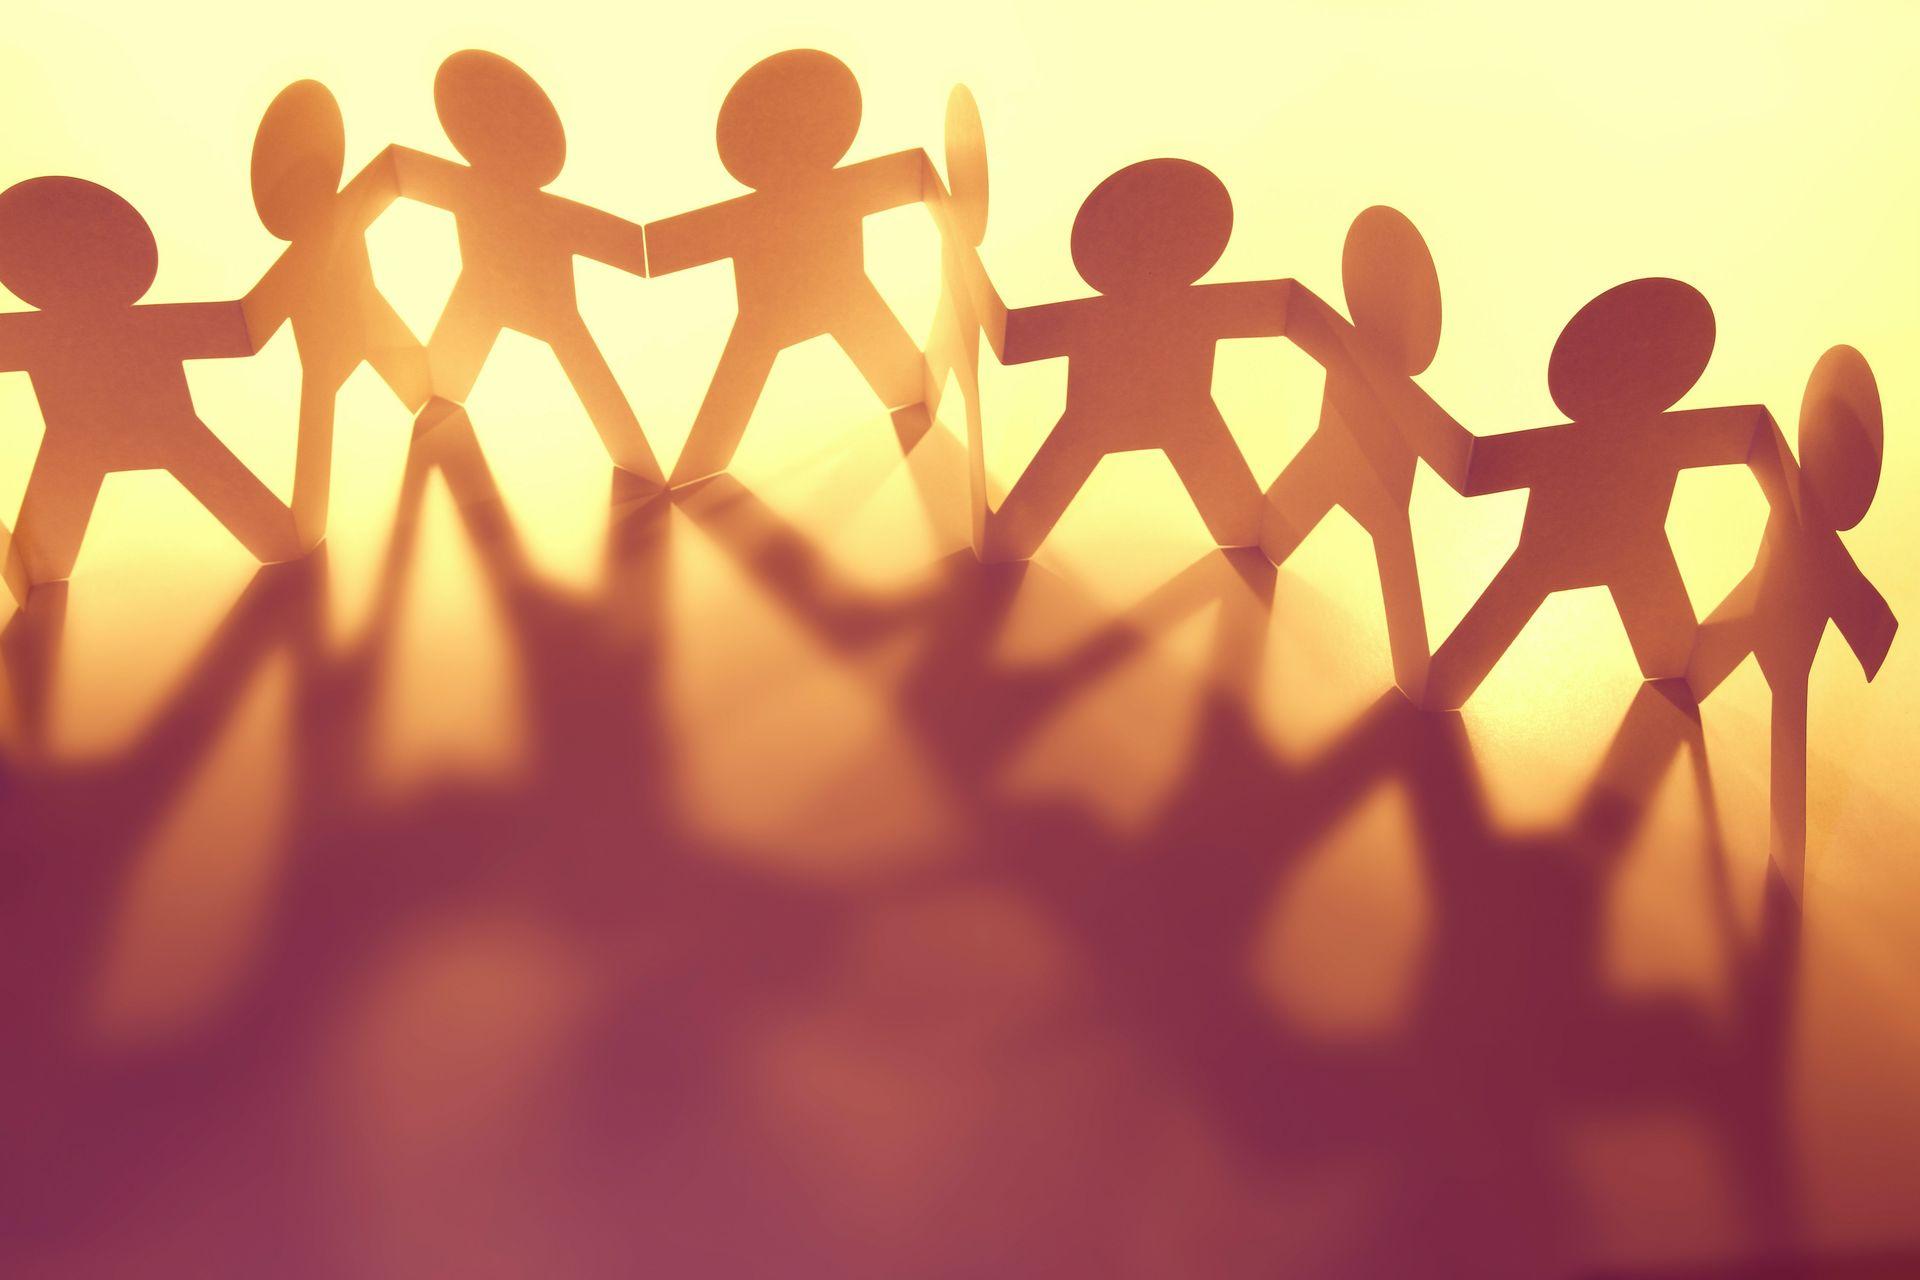 6359048108507086621542998848_customer-relationship-relationship